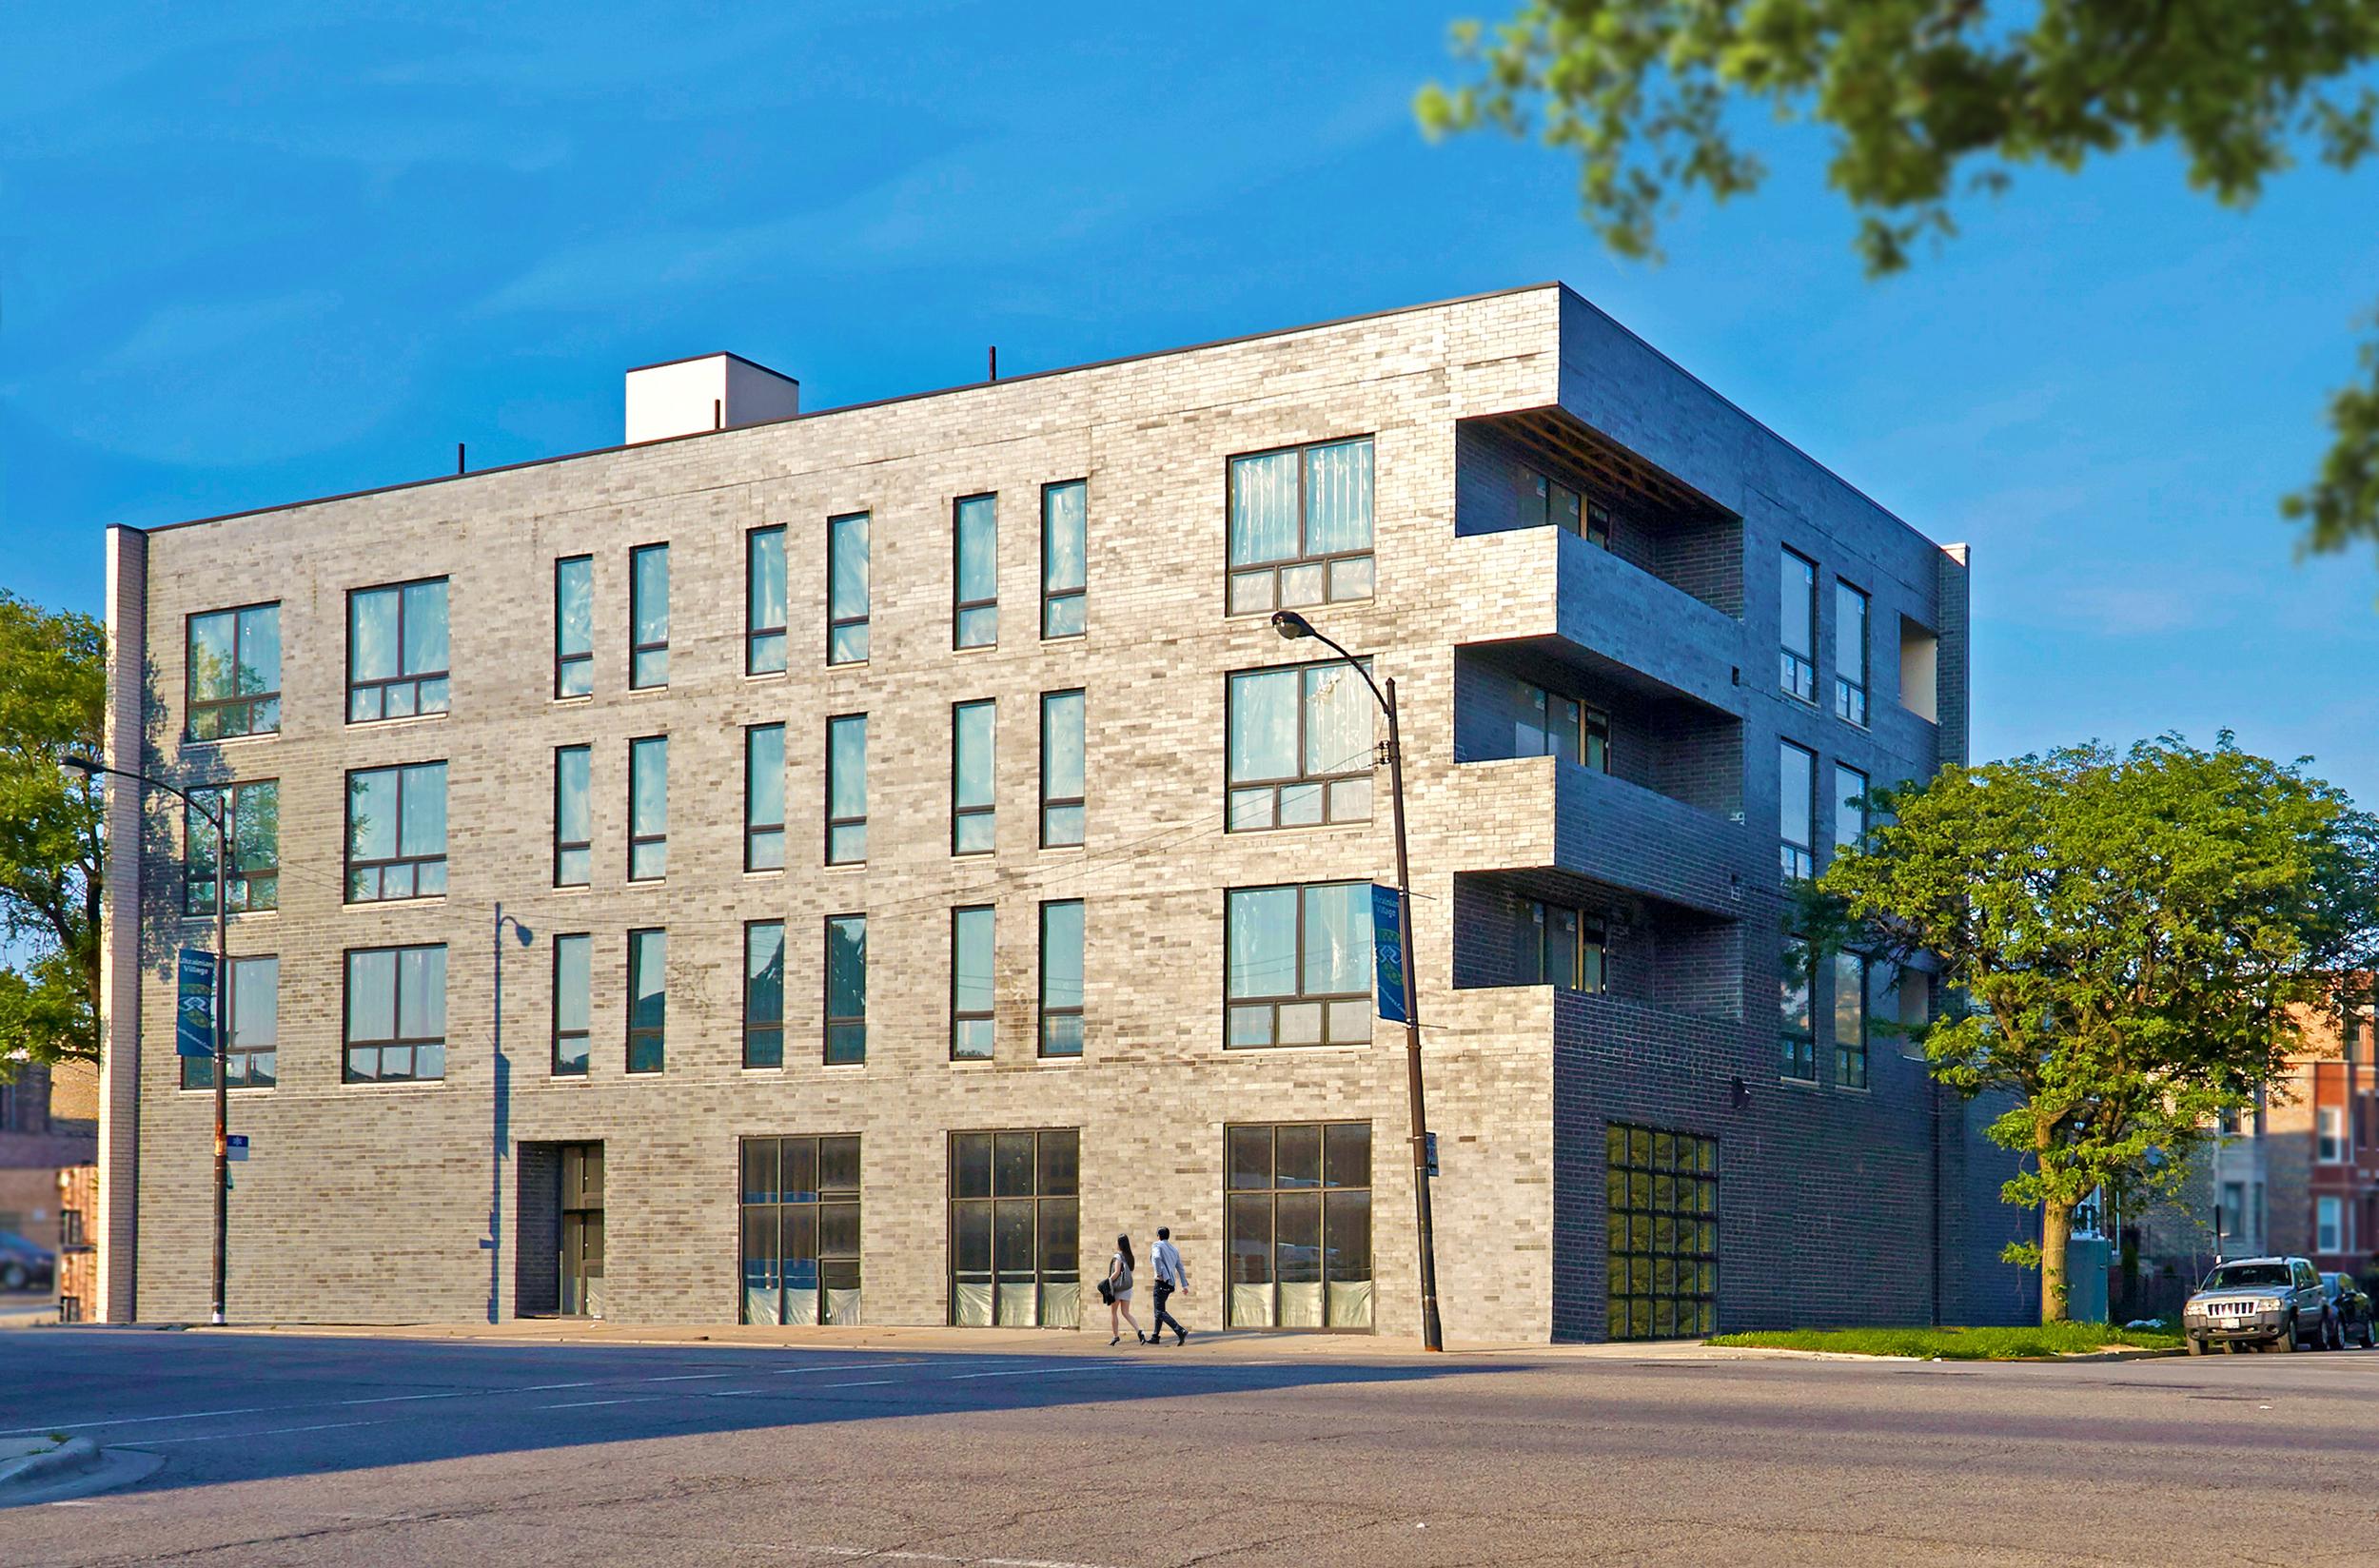 707 North Western Chicago Exterior TARIS Real Estate